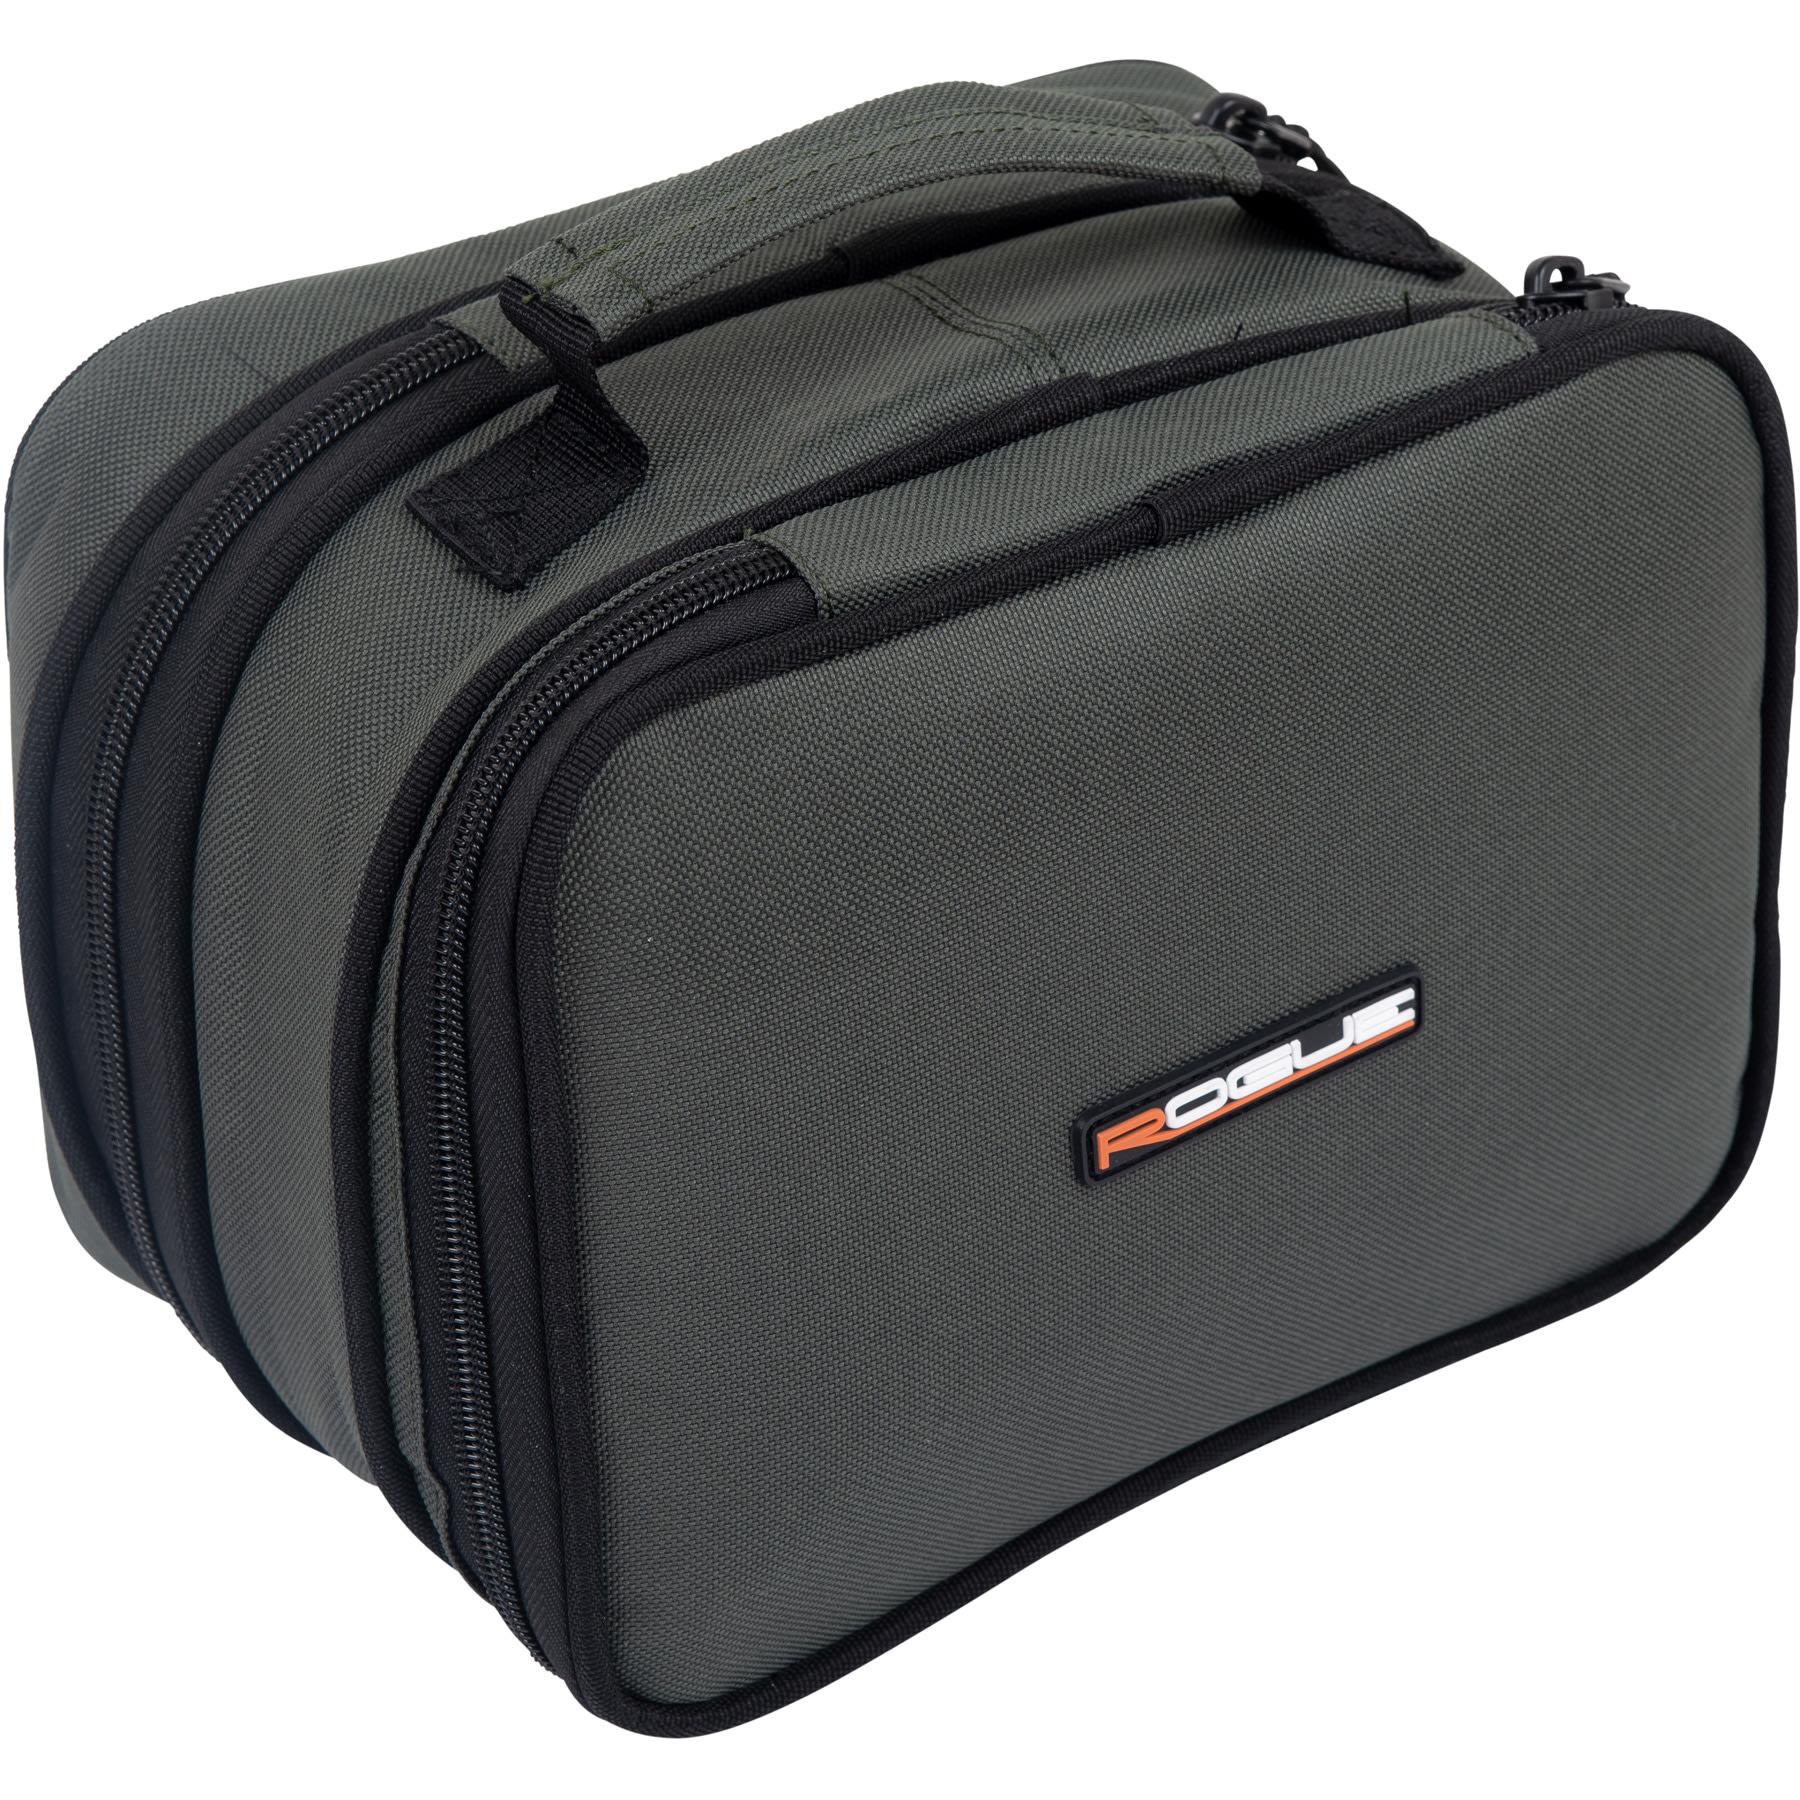 Leeda Pouzdra na doplňky Rogue Wallet Bag